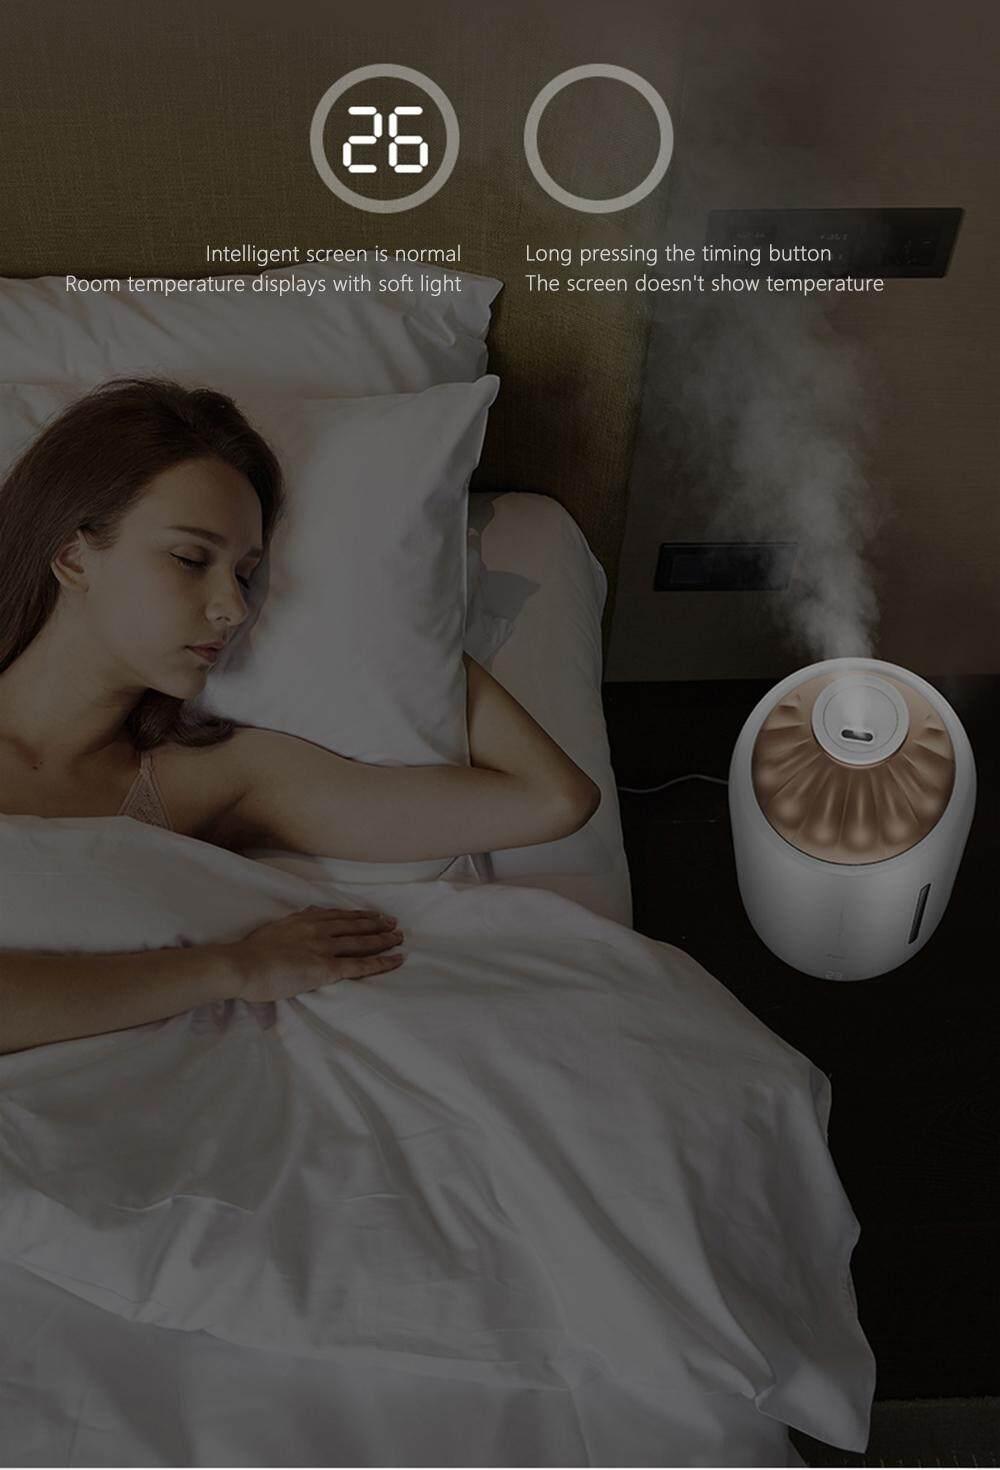 DEERMA Household Humidifier Air Purifying Mist Maker